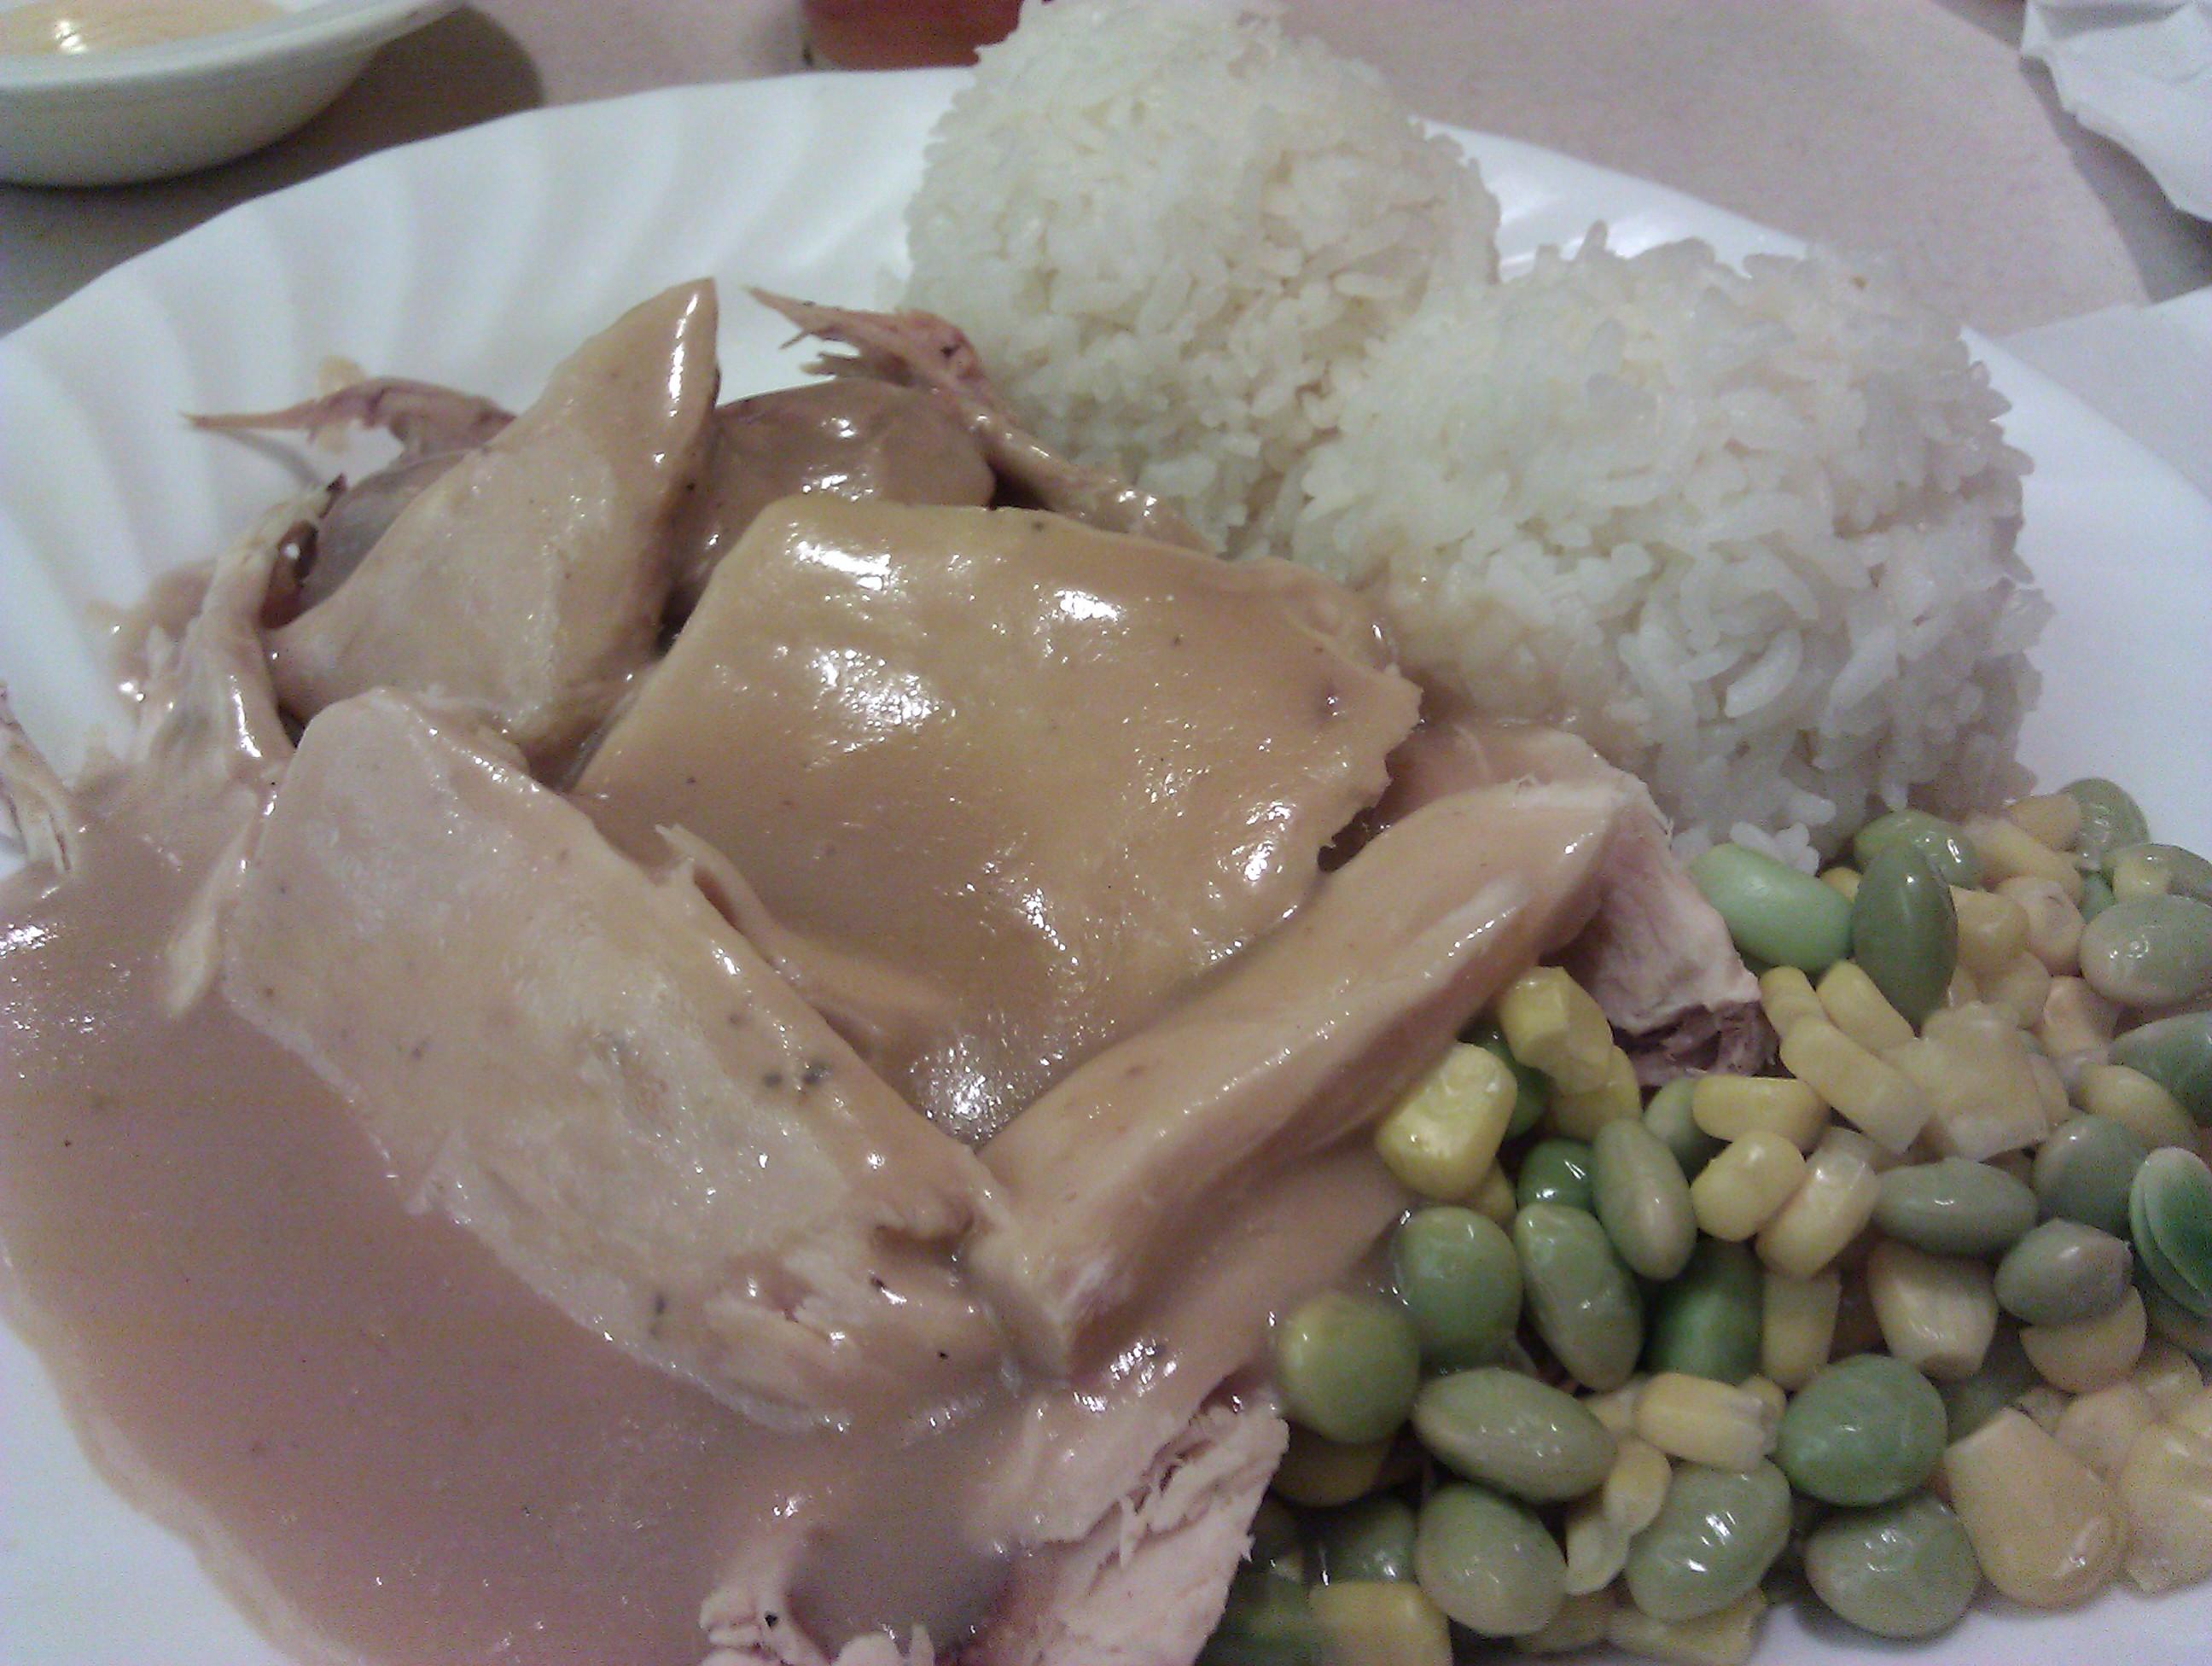 The ParkRat FoodPosse Visits Zippys Kahala for Dinner (@zippys)